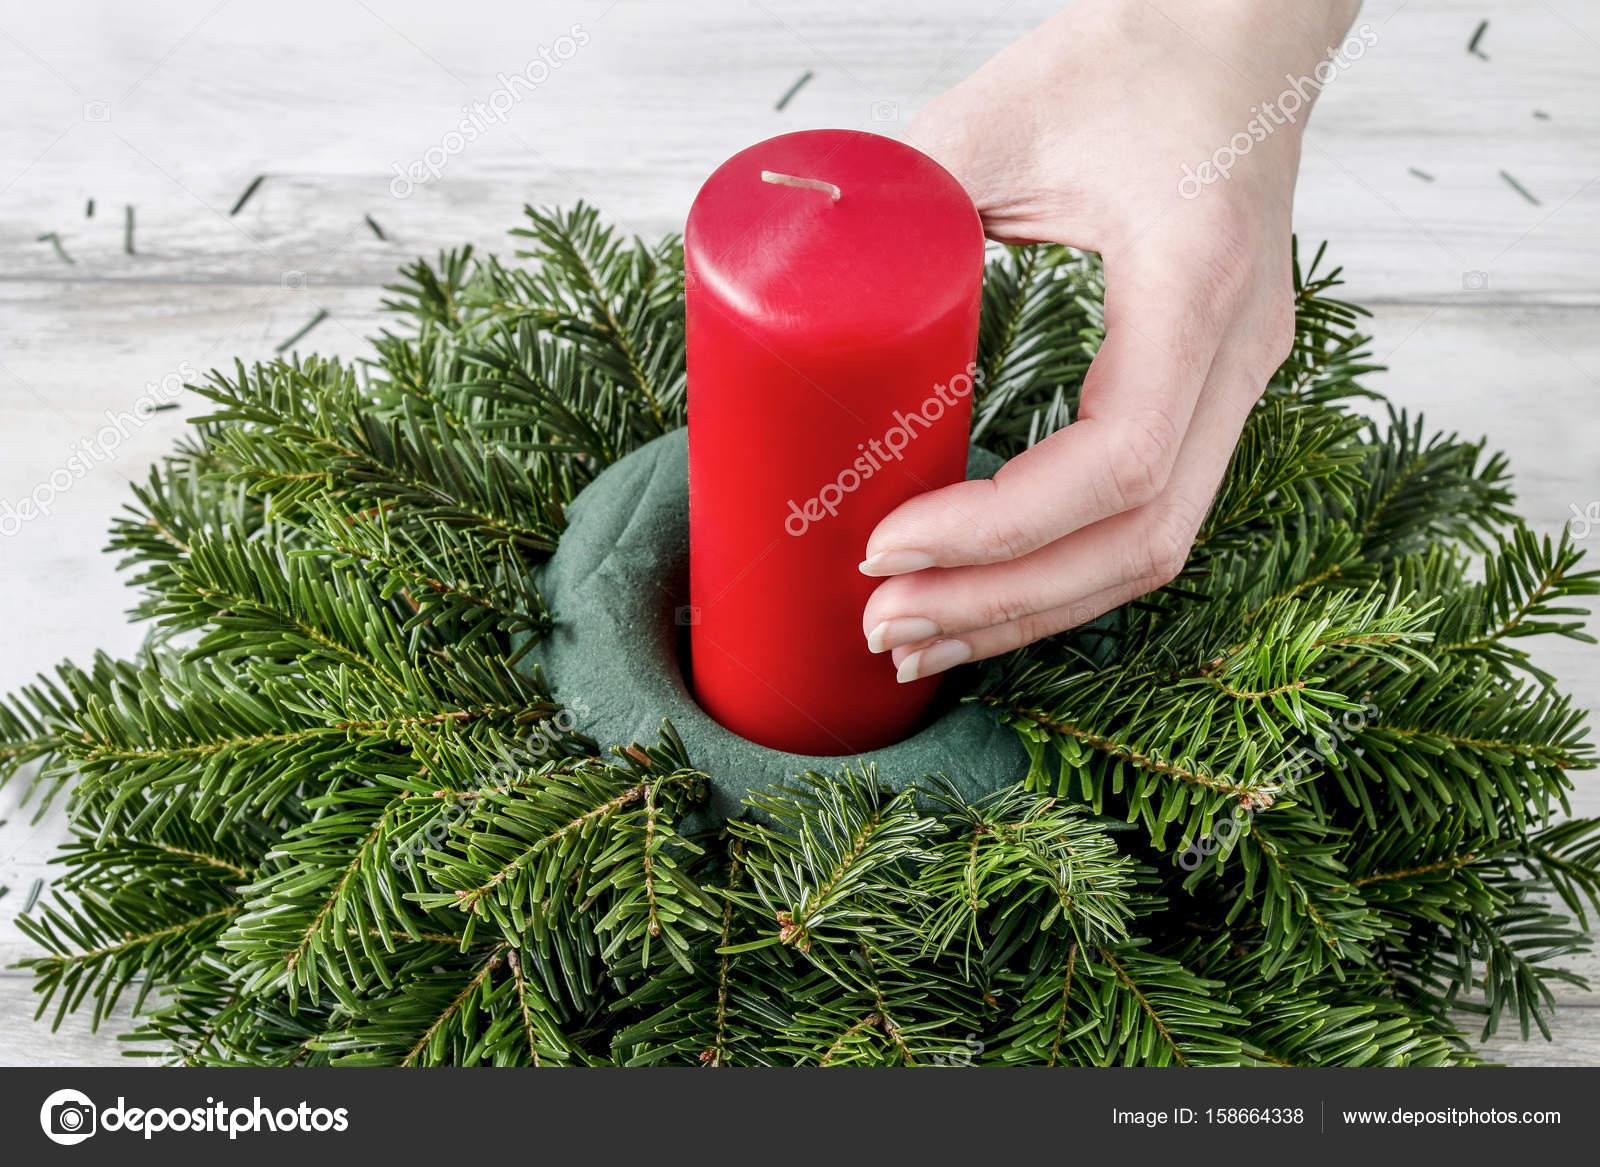 Como Hacer Centro De Mesa Navidad Con Abeto Rosas Bolas De Un - Como-hacer-centro-de-navidad